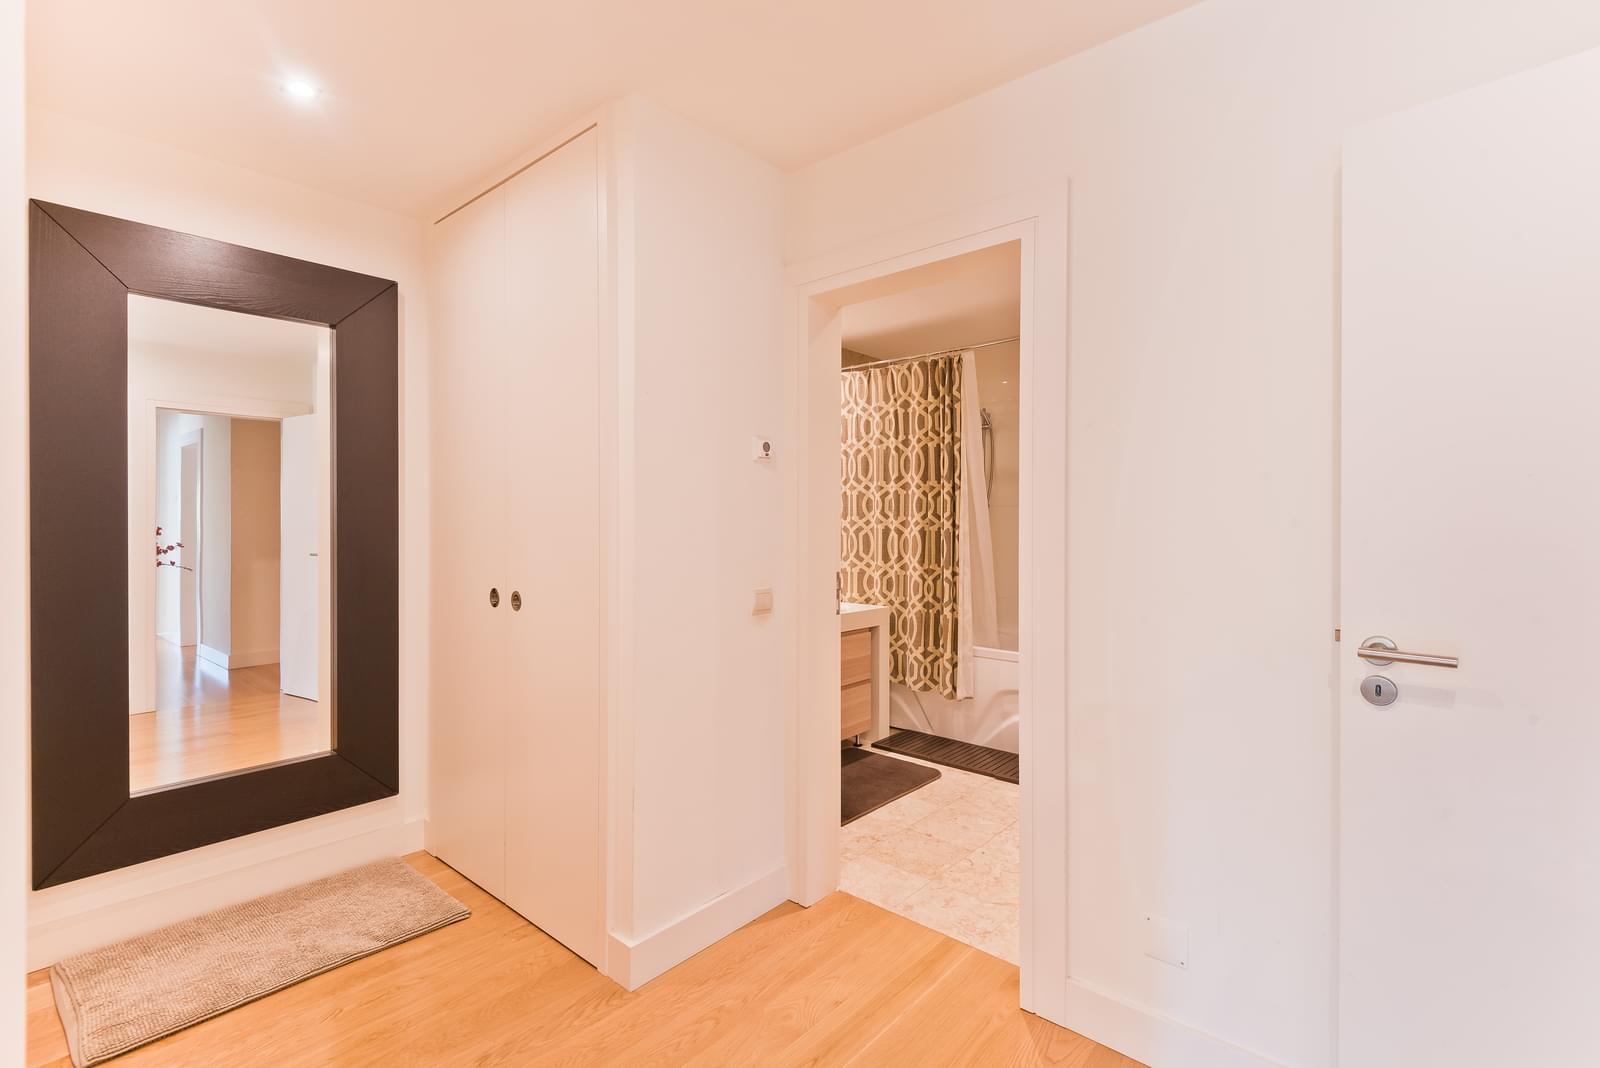 pf18836-apartamento-t3-cascais-b08bb617-f831-46eb-8543-80edb27a80f3